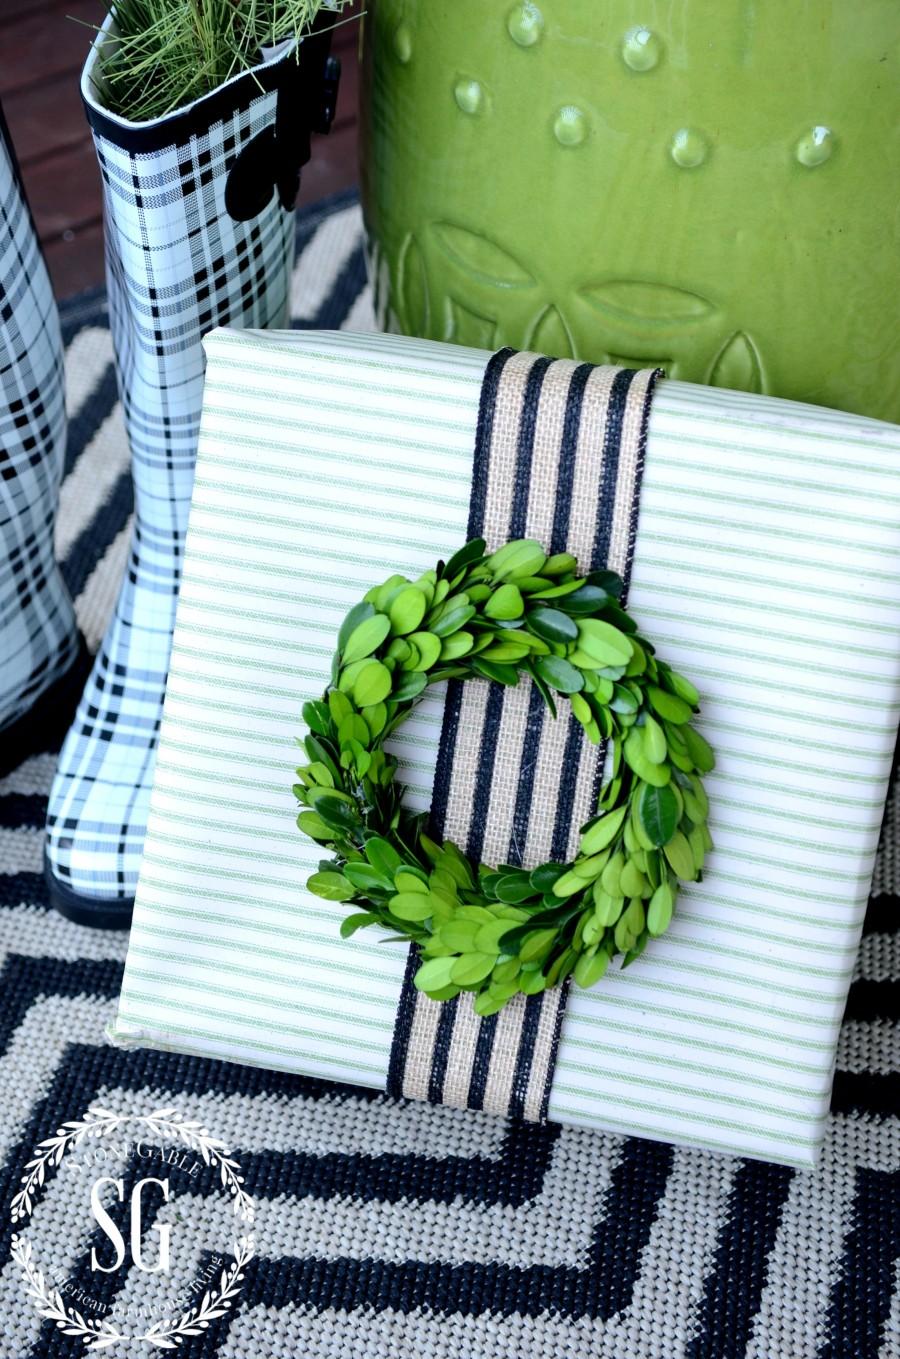 CHRISTMAS GIFT WRAP-green and natural striped gift-stonegableblog.com